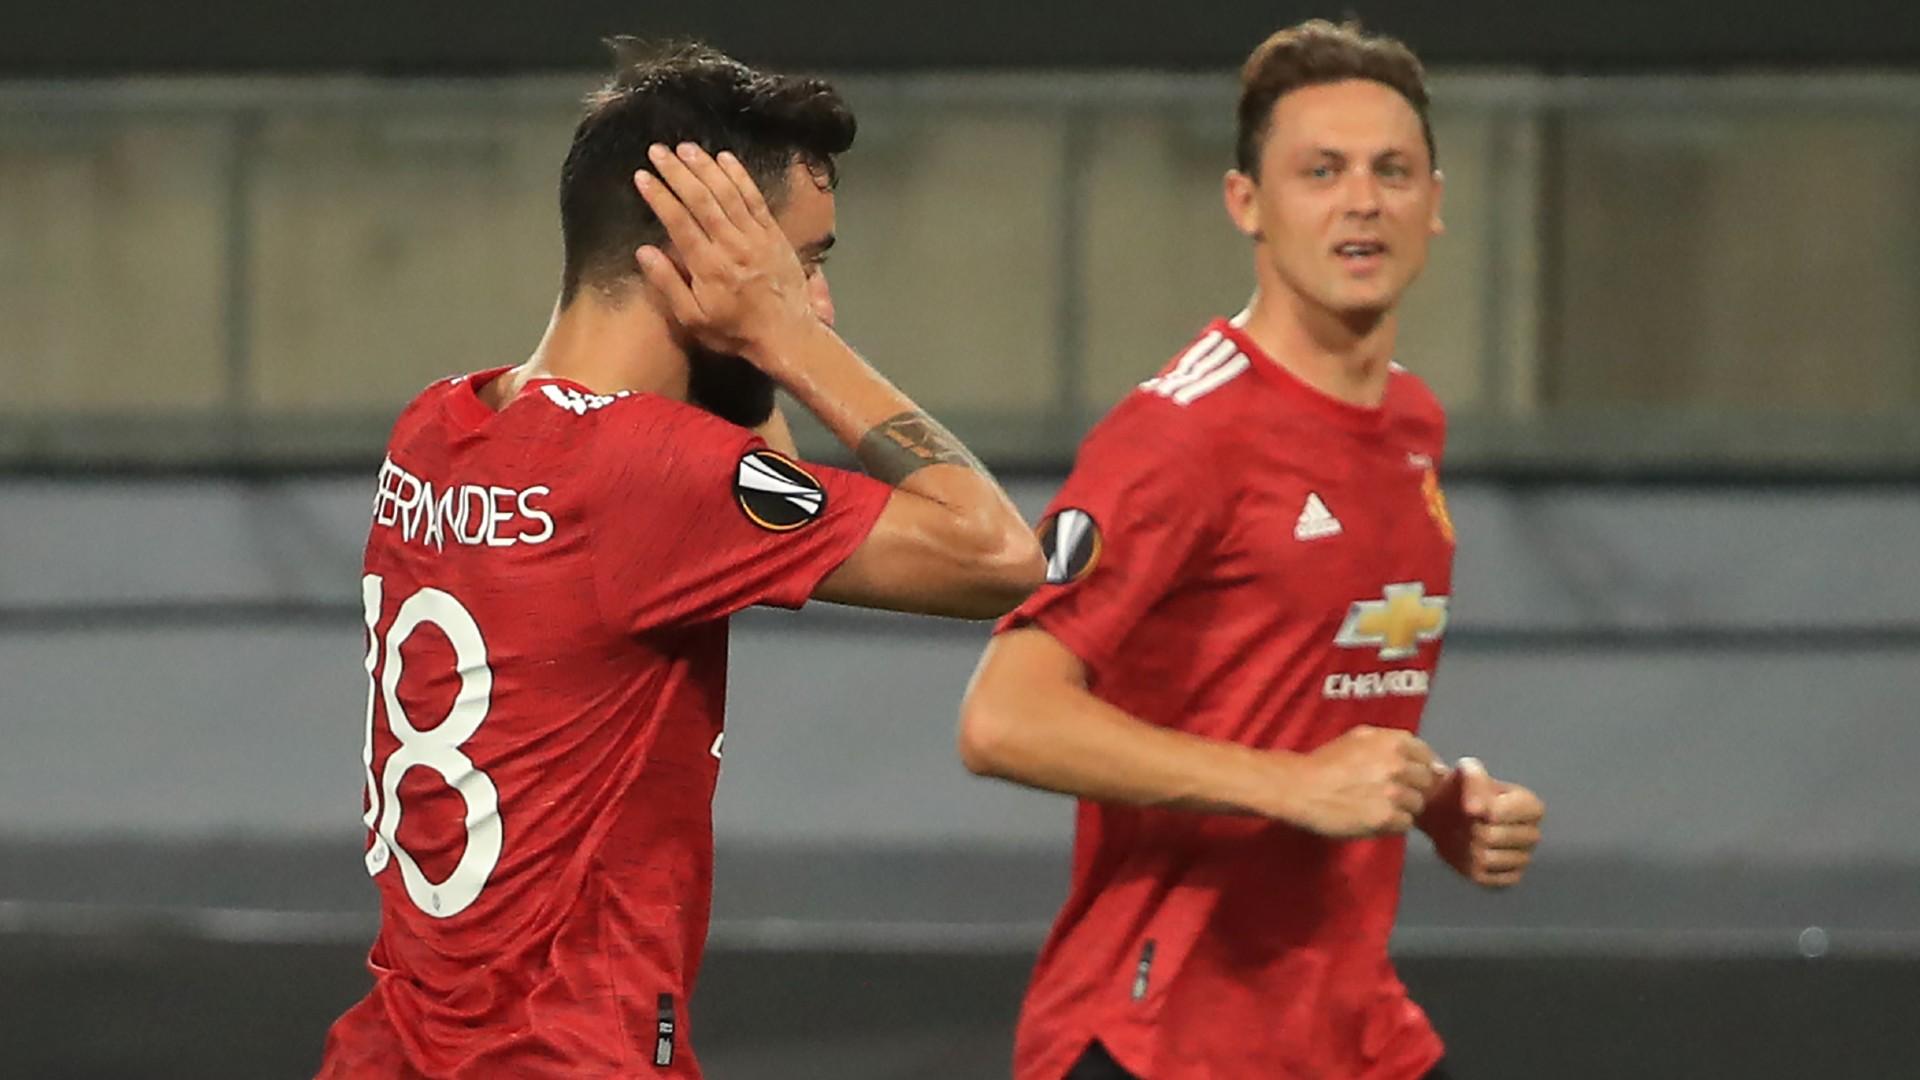 Man United, Inter Milan through to Europa League semis